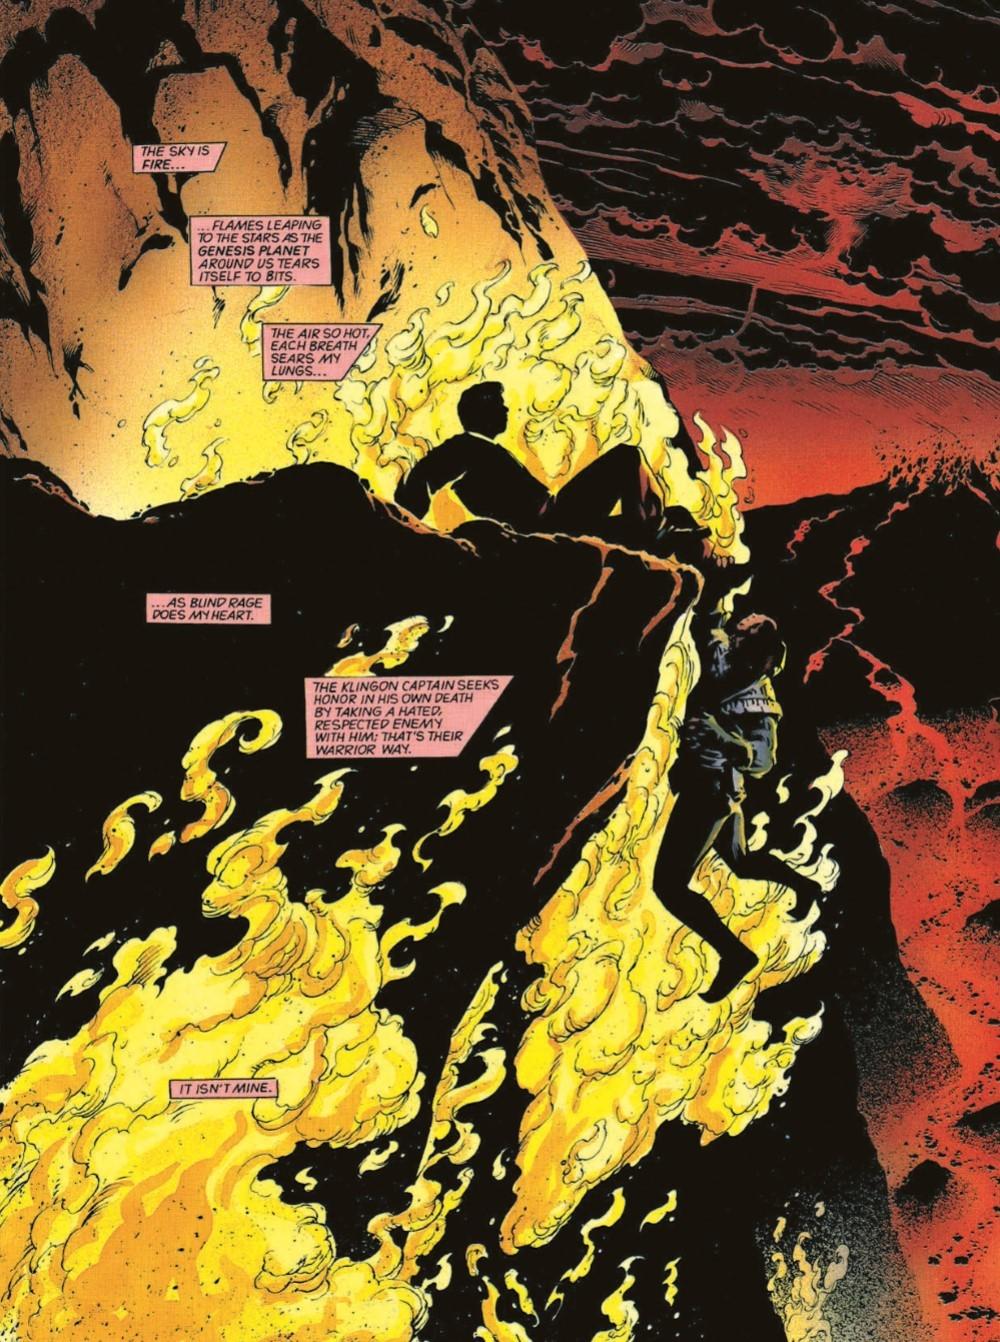 StarTrek_DebtofHonor-pr-4-1 ComicList Previews: STAR TREK DEBT OF HONOR CLASSIC EDITION GN